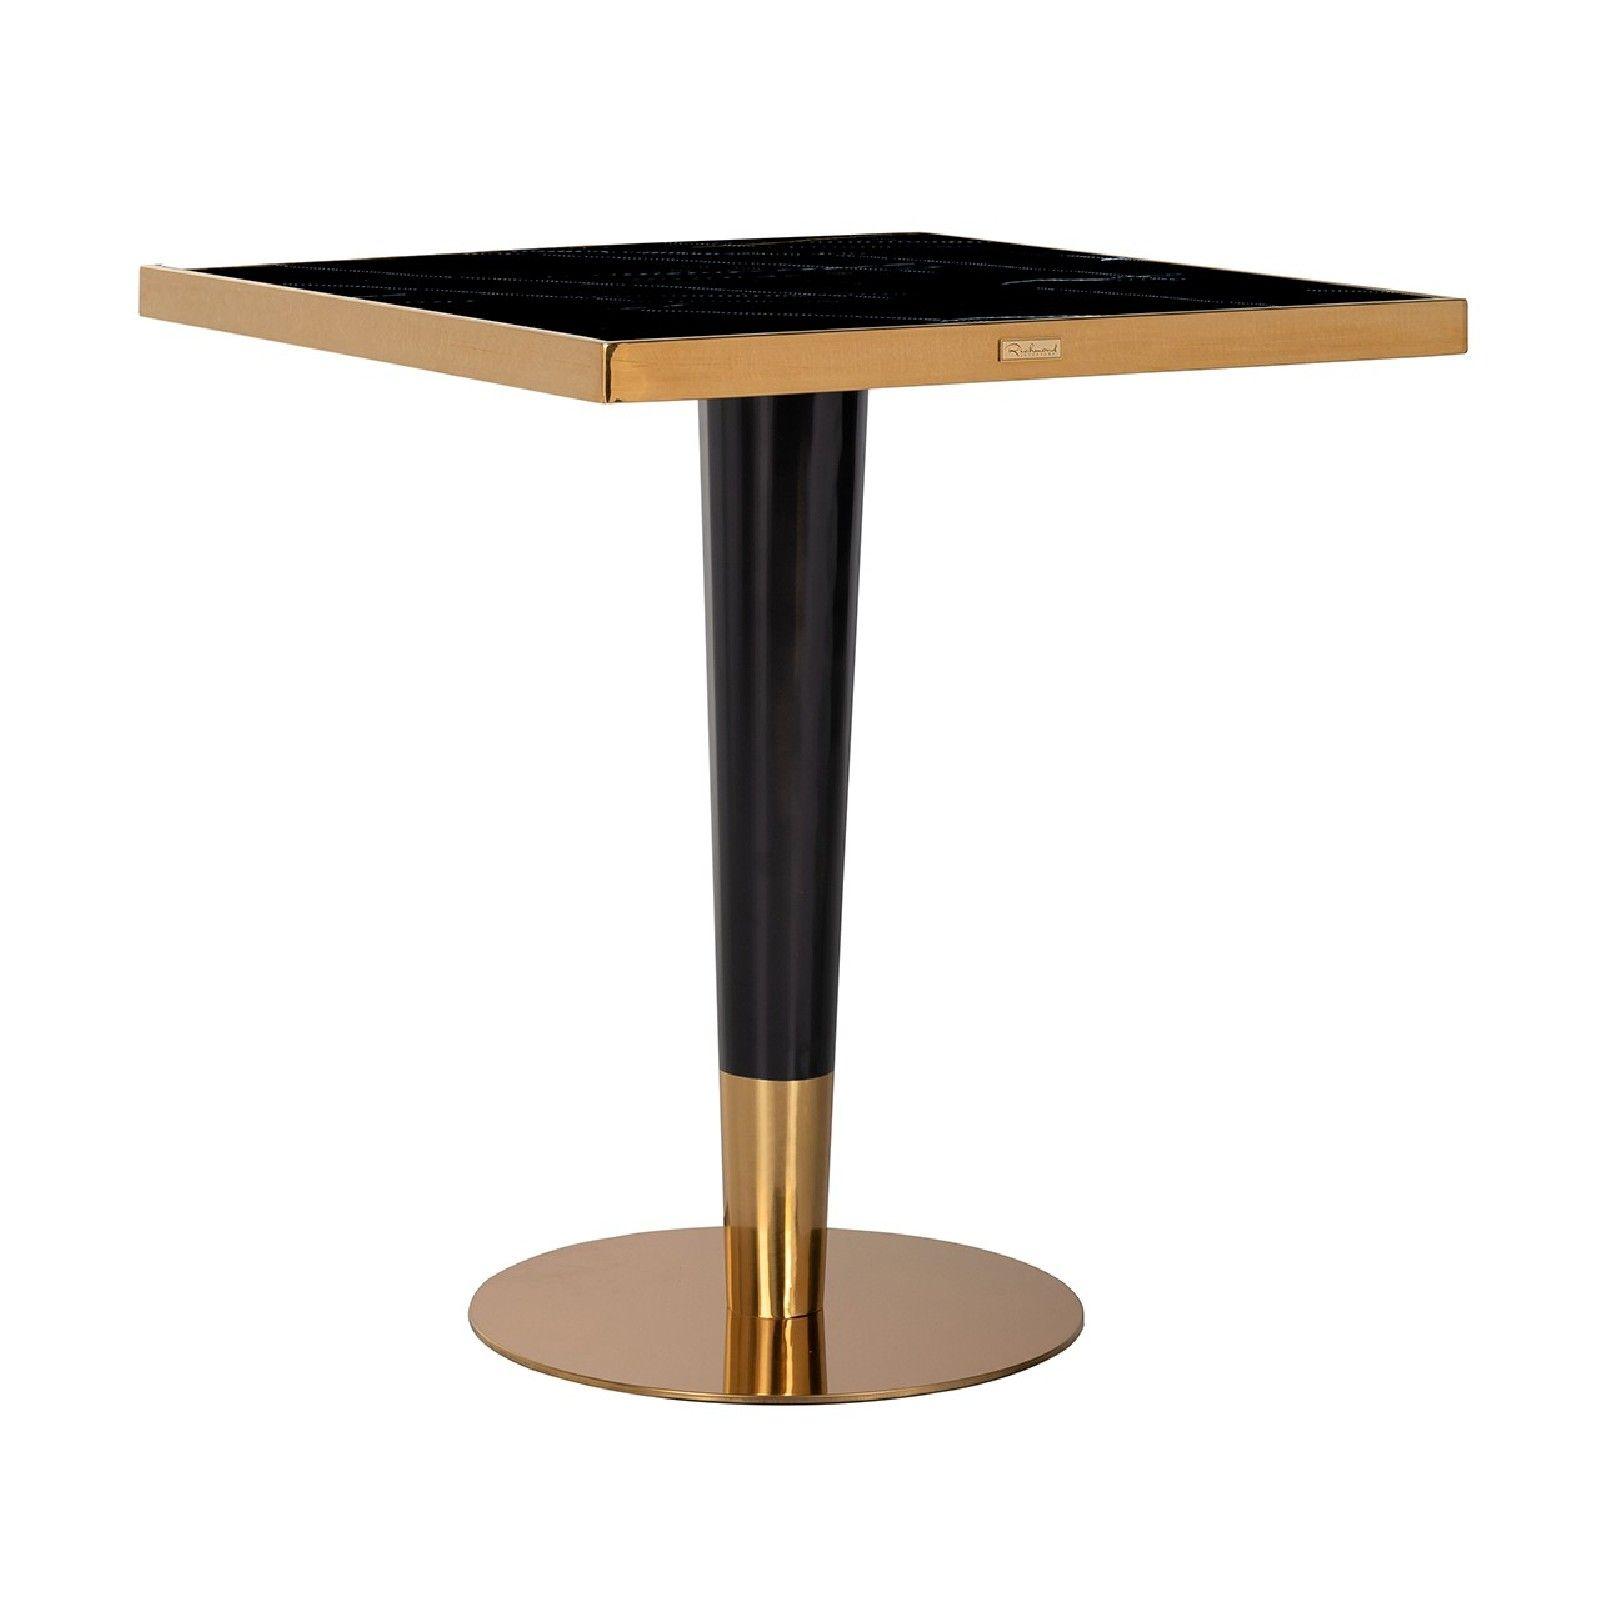 Table a diner Can Roca square black 70x70 Meuble Déco Tendance - 30